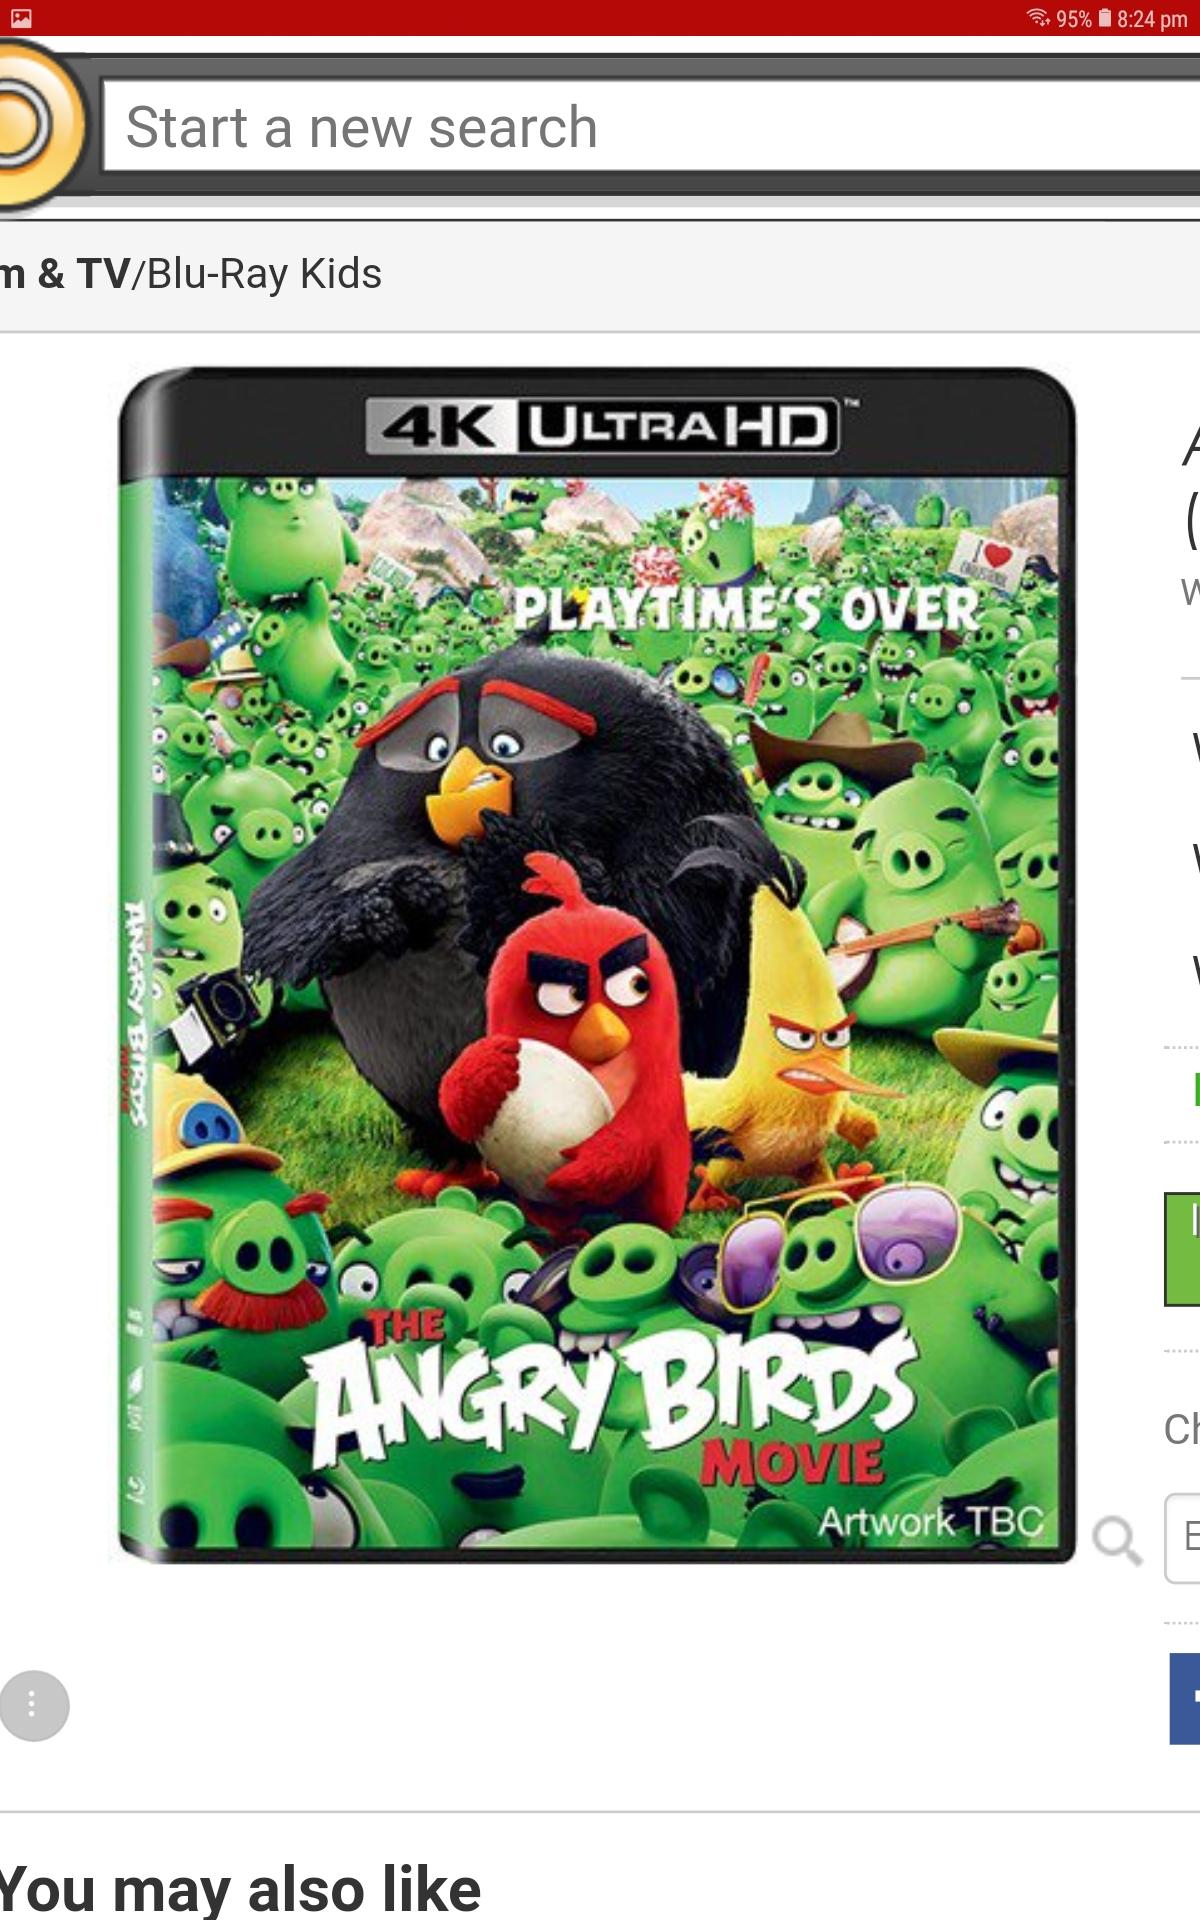 Angry Birds Movie, The (U) 2016 4K UHD+BR @ Cex UK £6